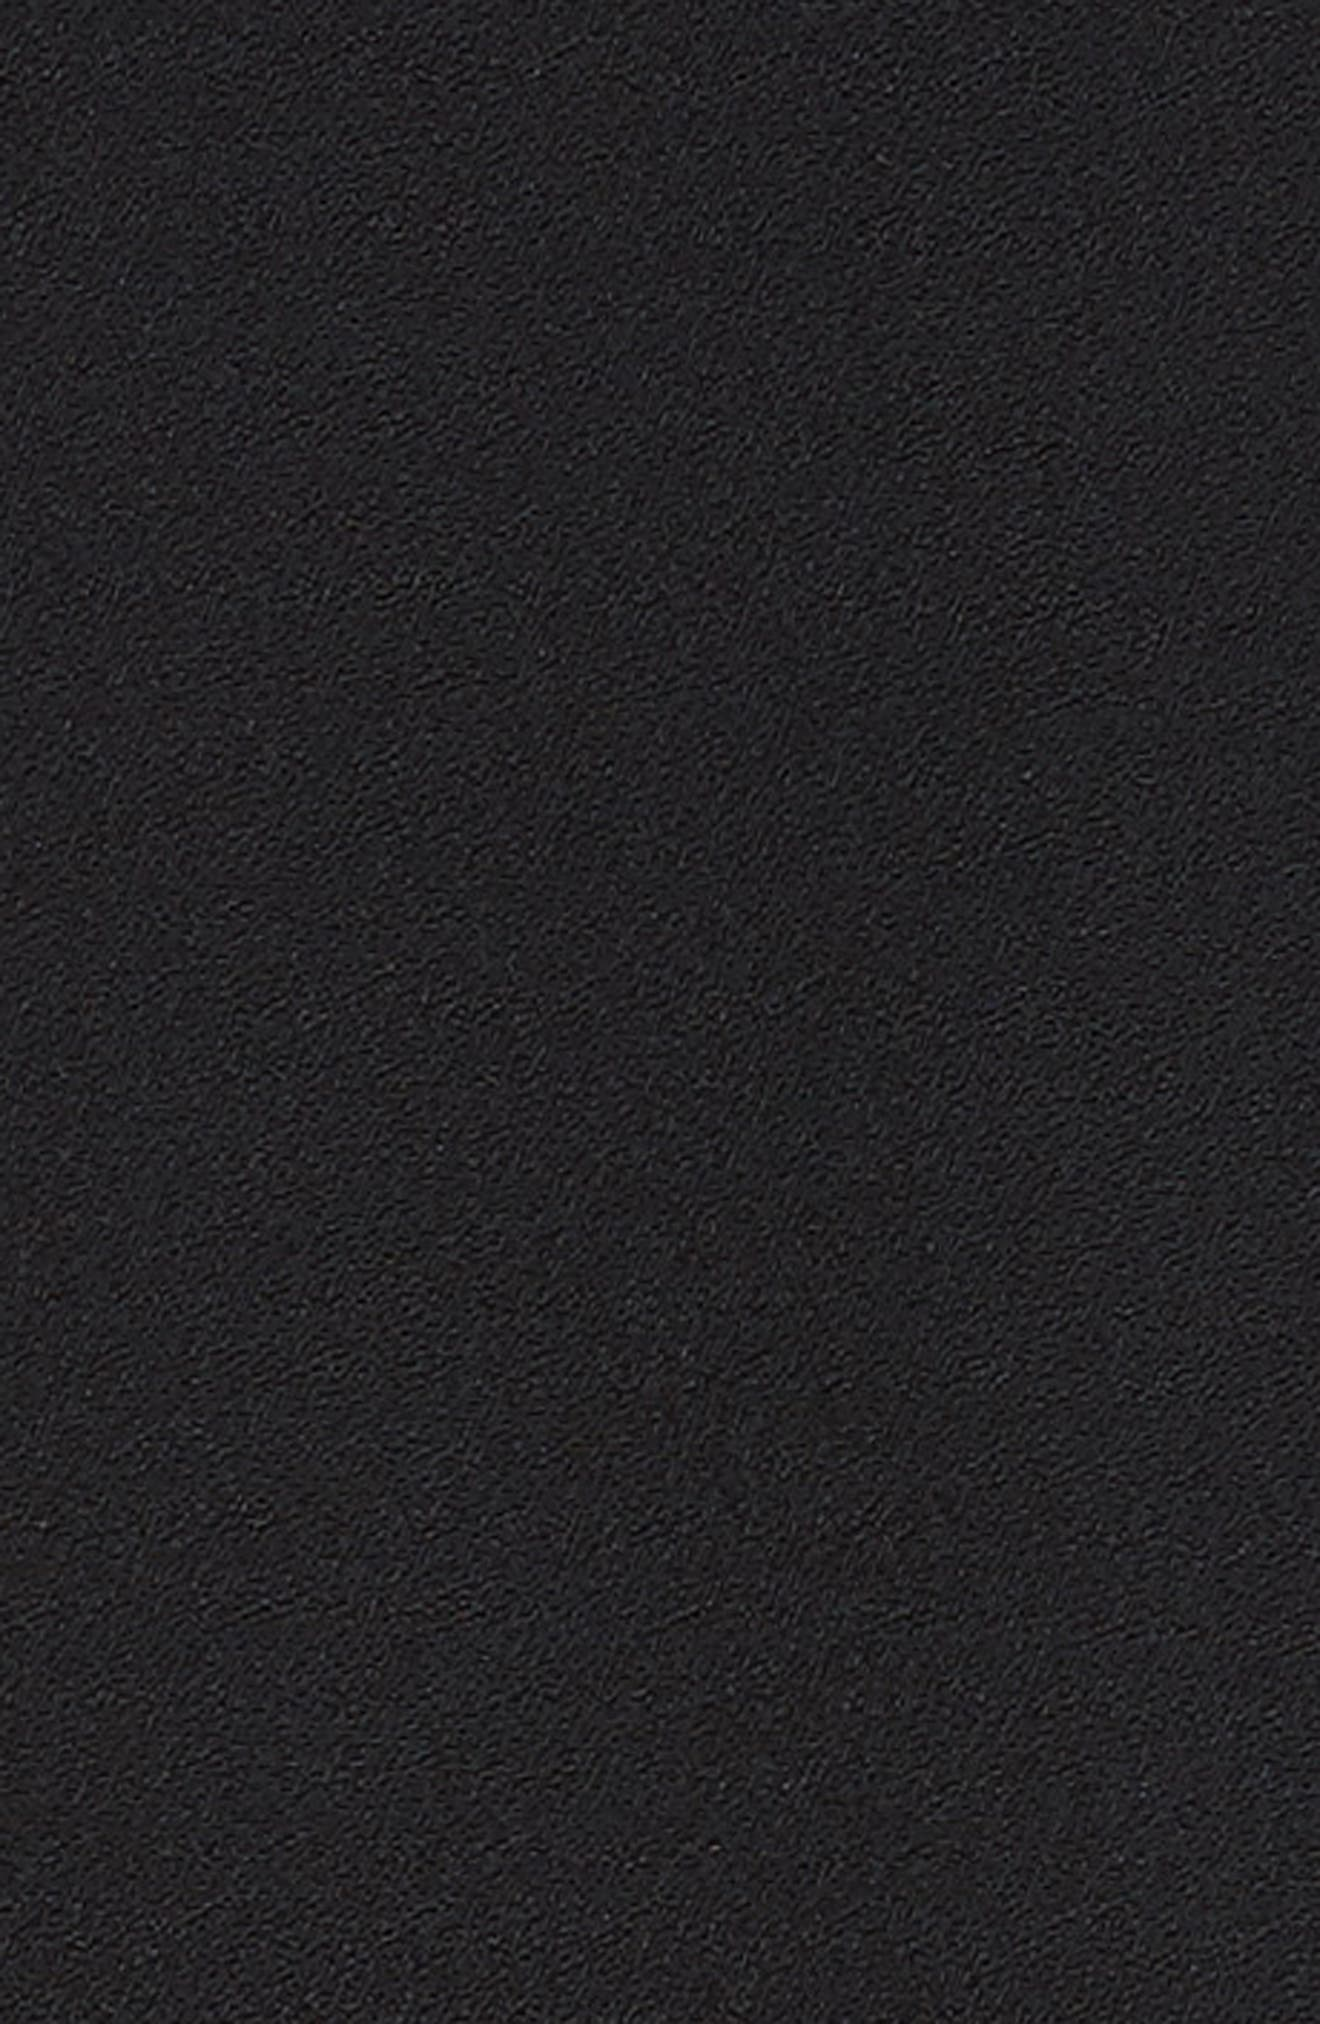 One-Shoulder Draped Cady Dress,                             Alternate thumbnail 6, color,                             Black